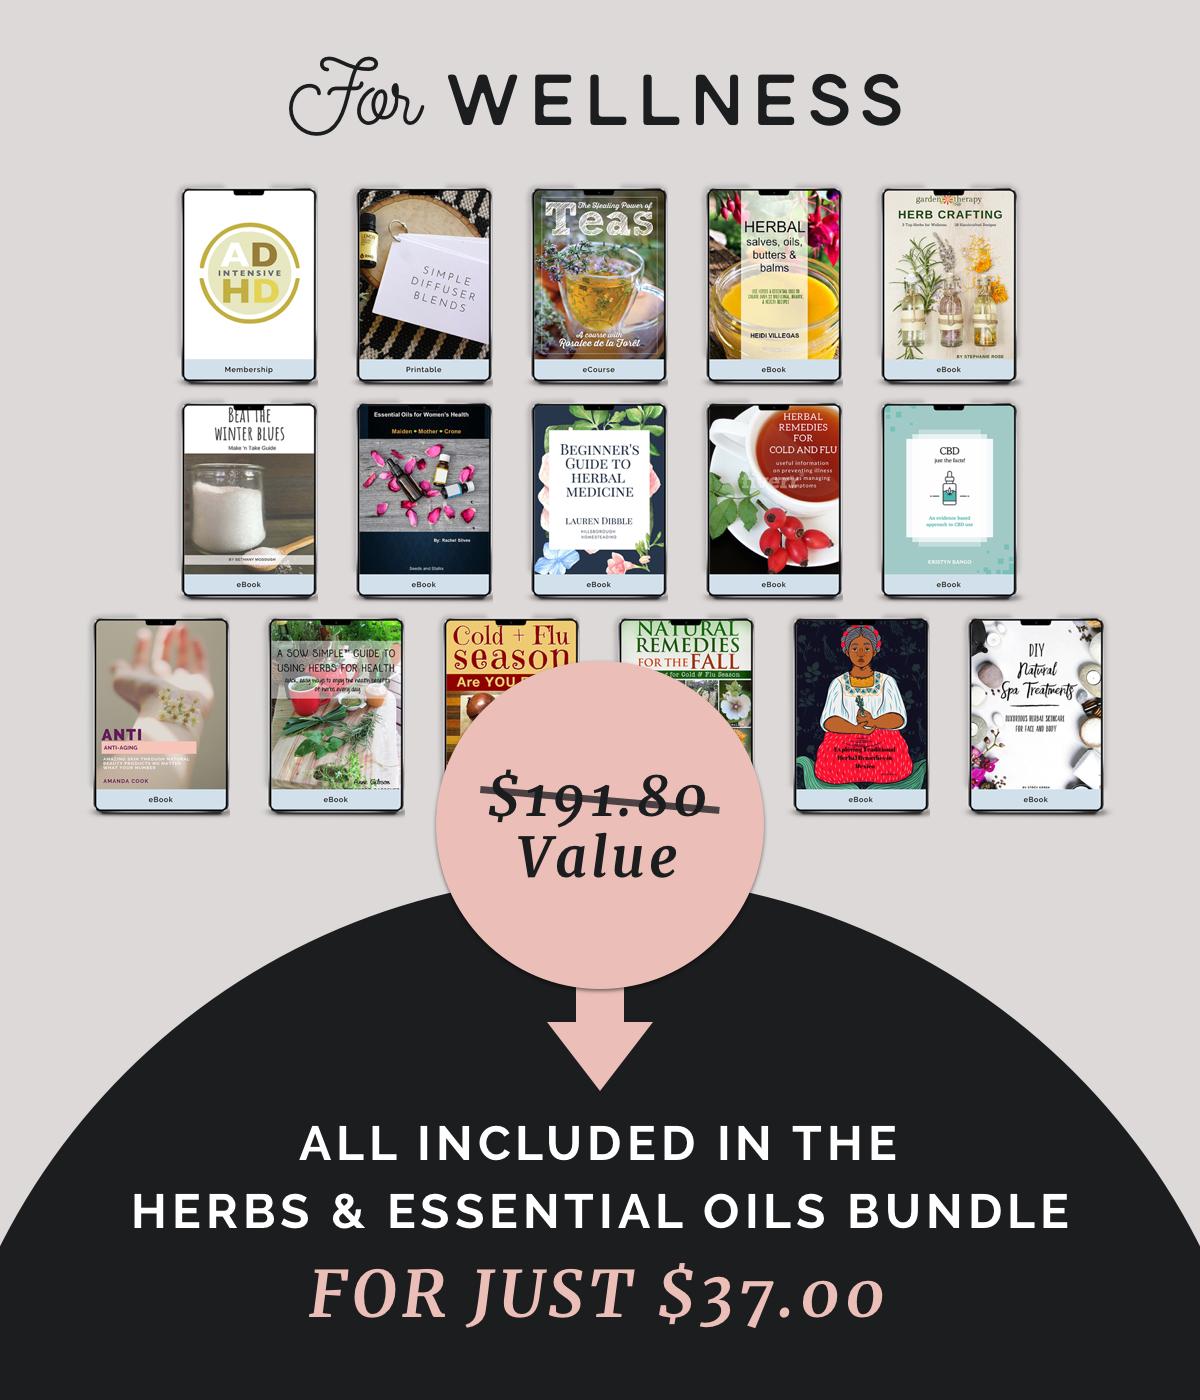 wellness, herbs, essential oils, resources, bundle